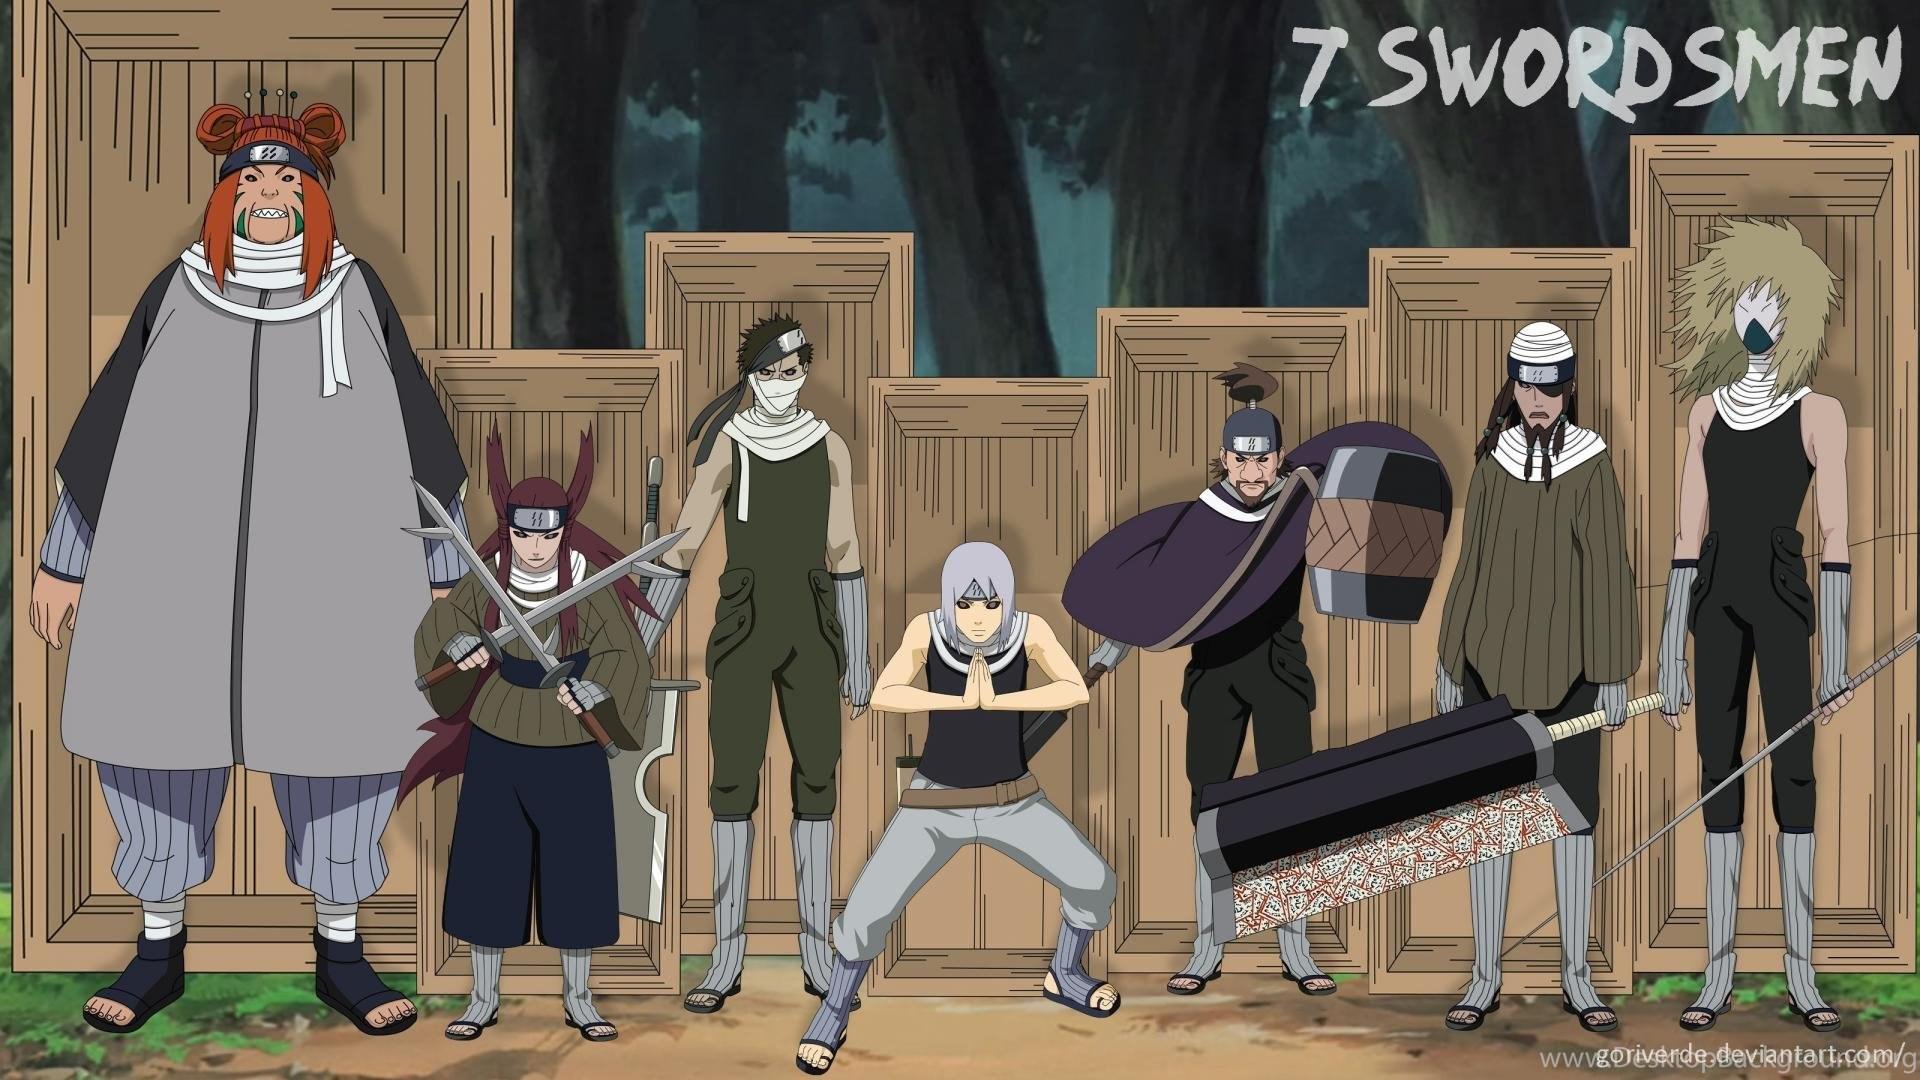 Naruto Shippuden Swordman Zabuza Momochi Edo Tensei Wallpapers Desktop Background